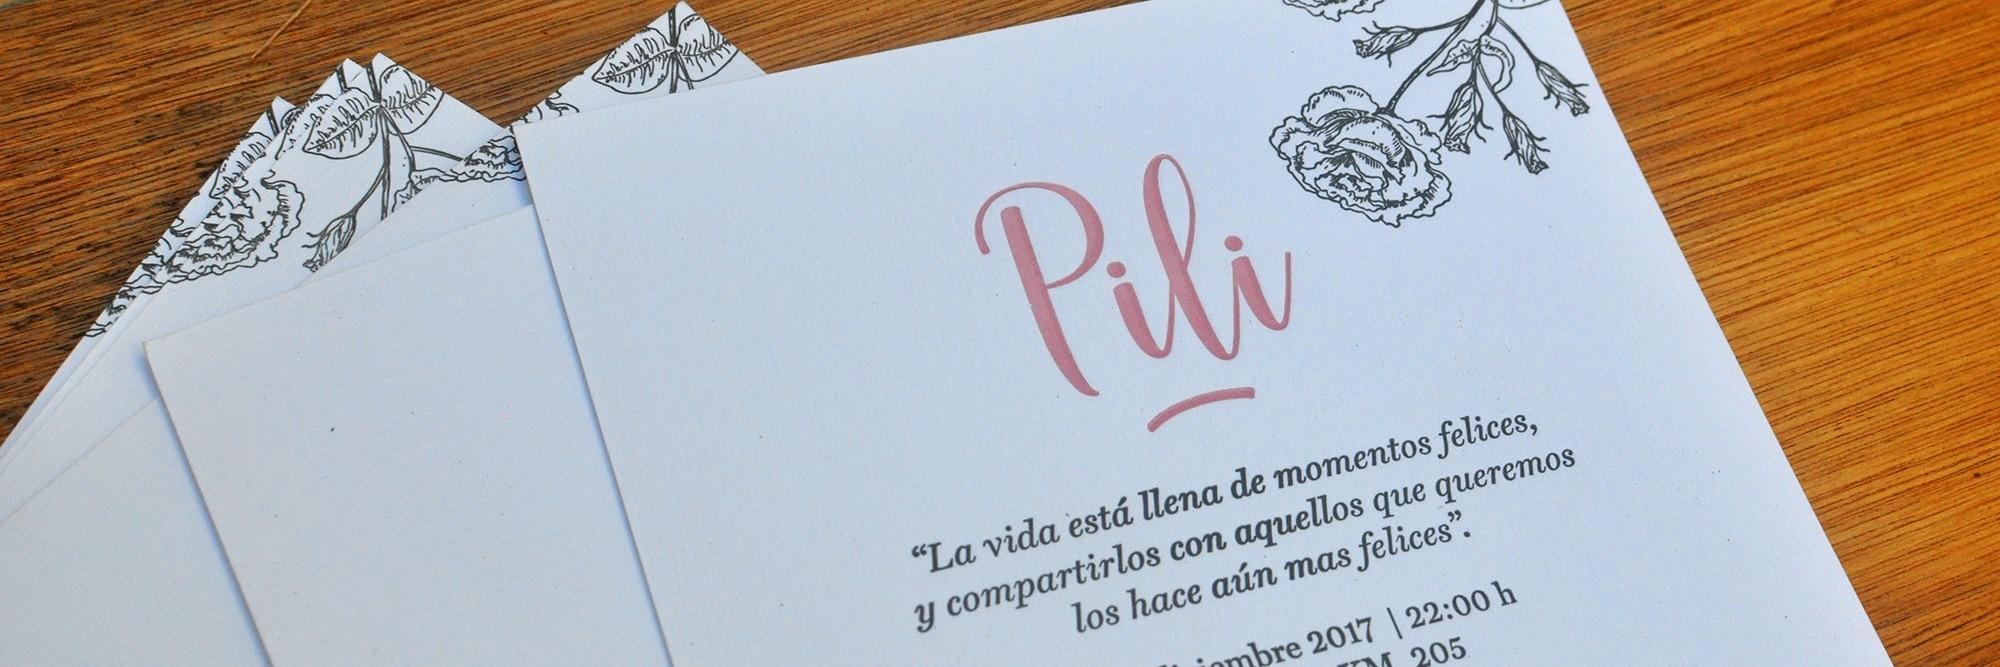 pili header